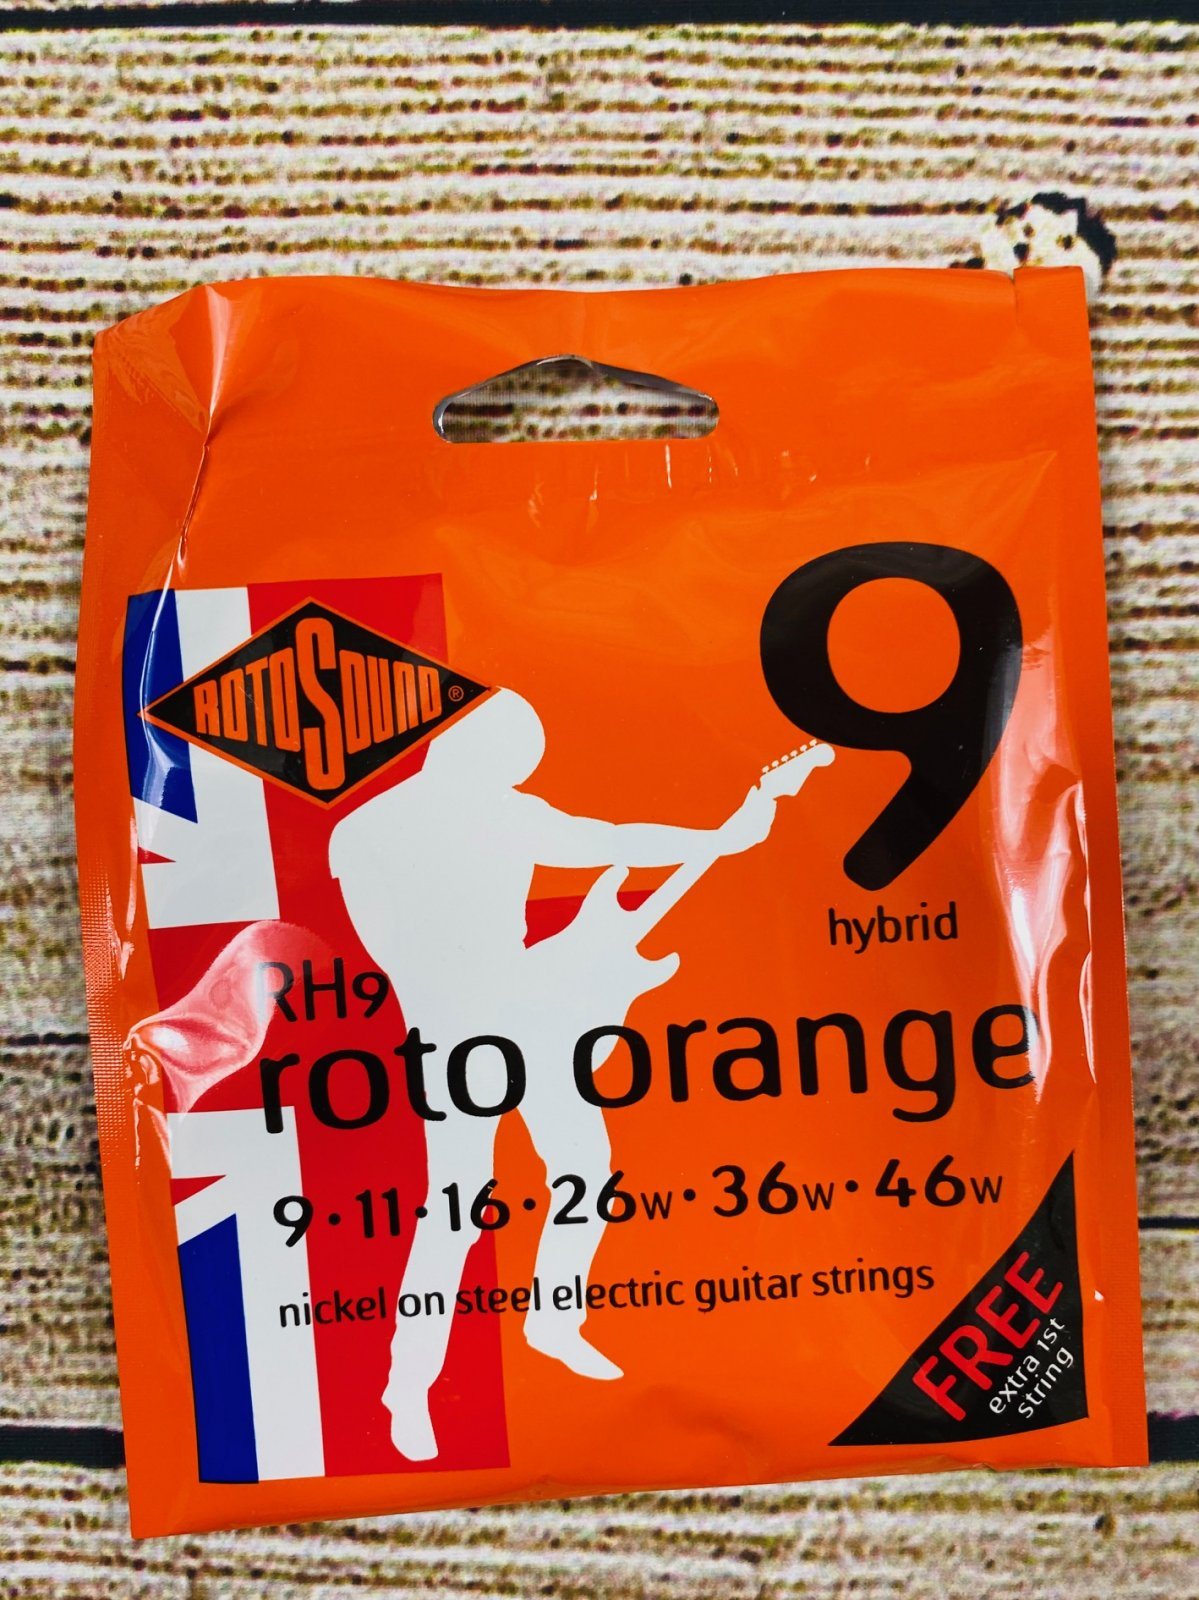 Rotosound RH9 Roto Orange Nickel On Steel Electric Guitar Strings - .009-.046 Hybrid